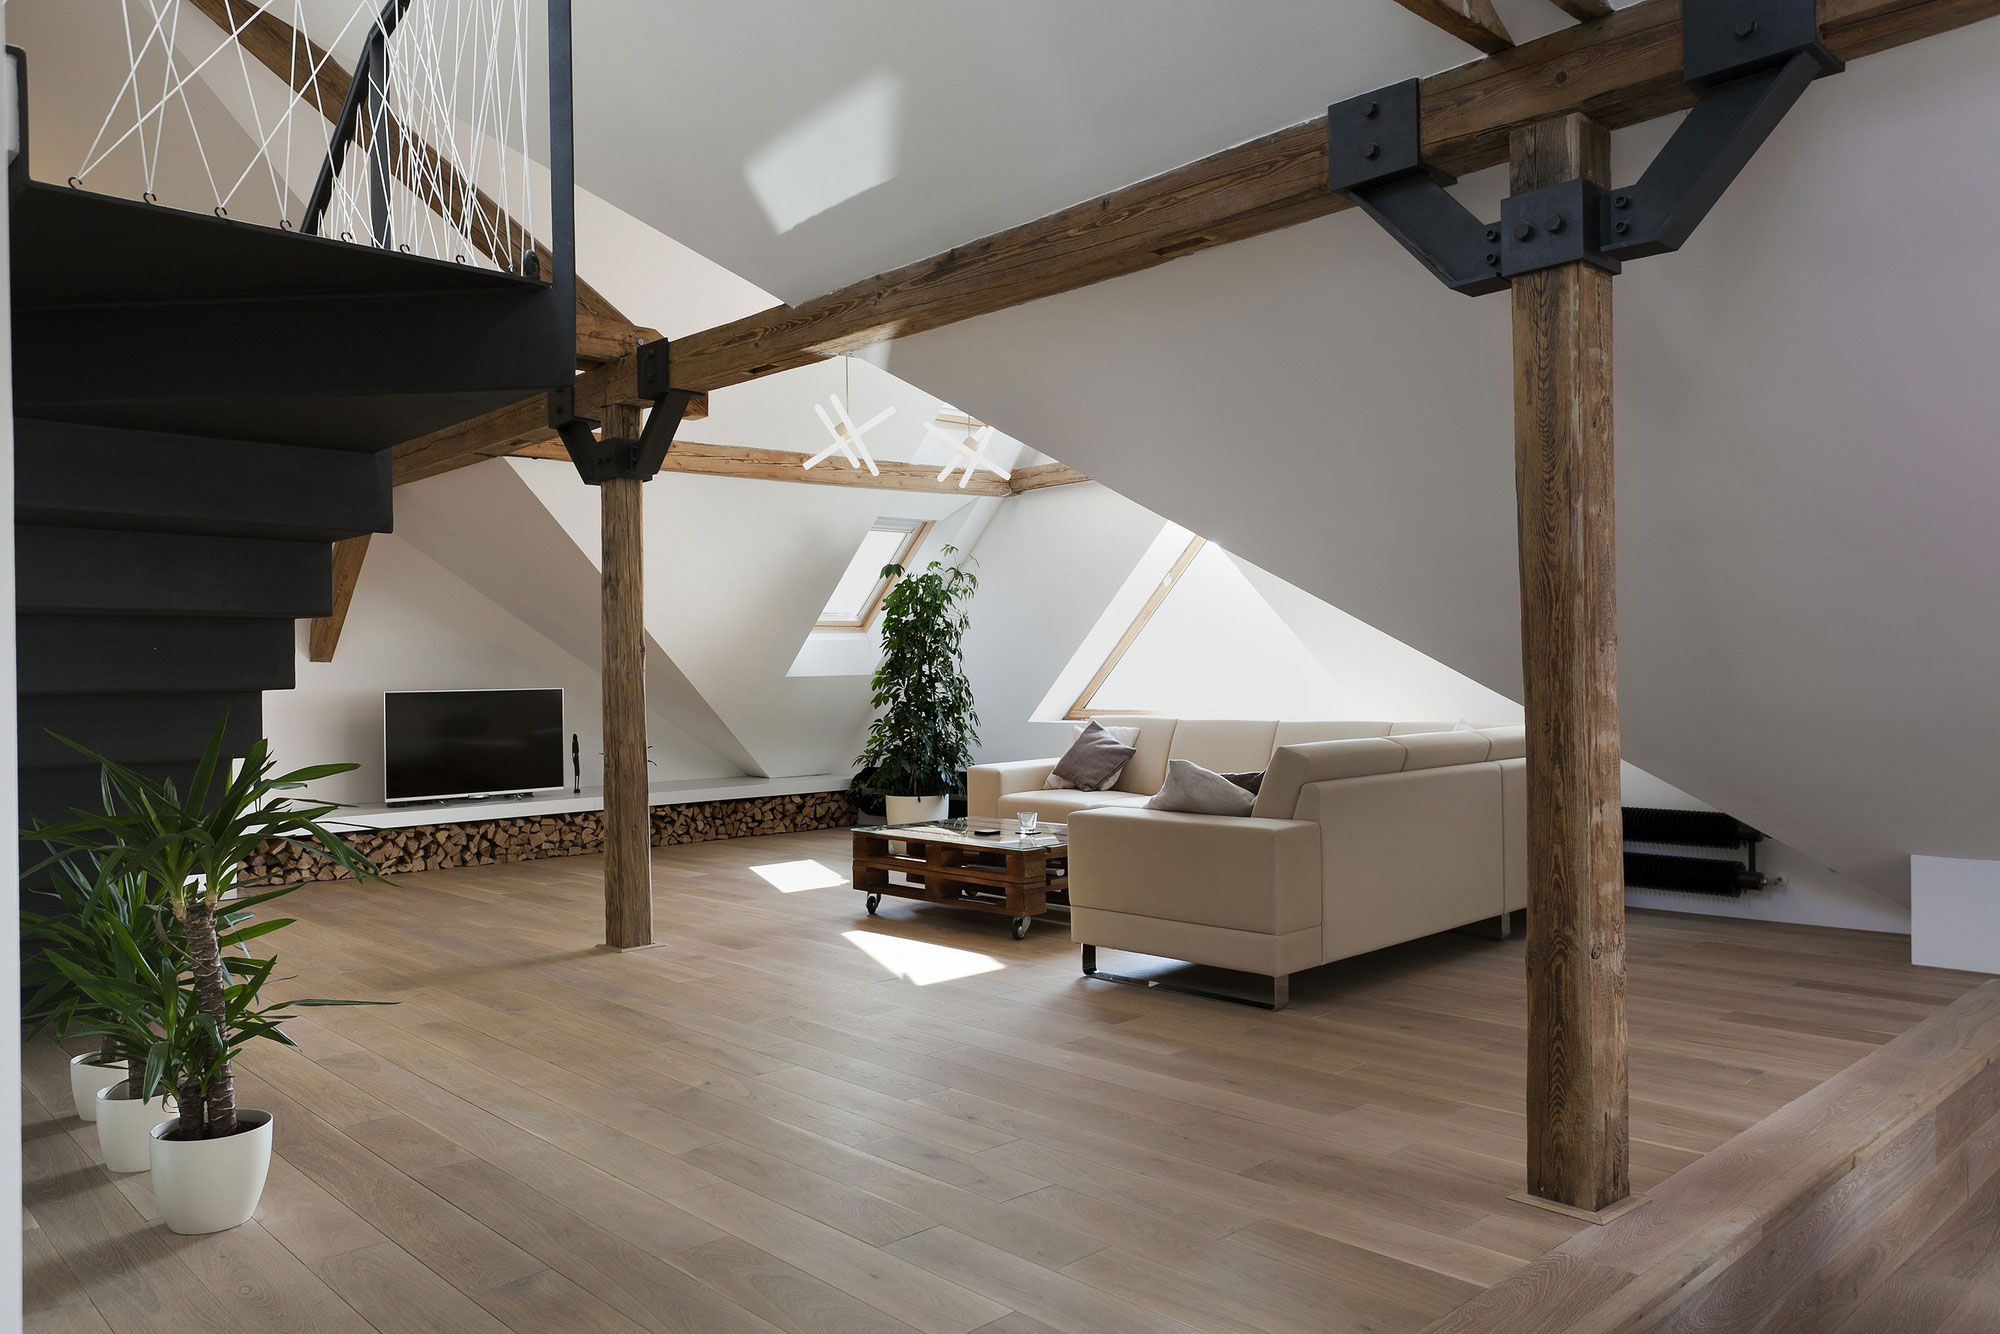 Attic Loft Reconstruction By B 178 Architecture